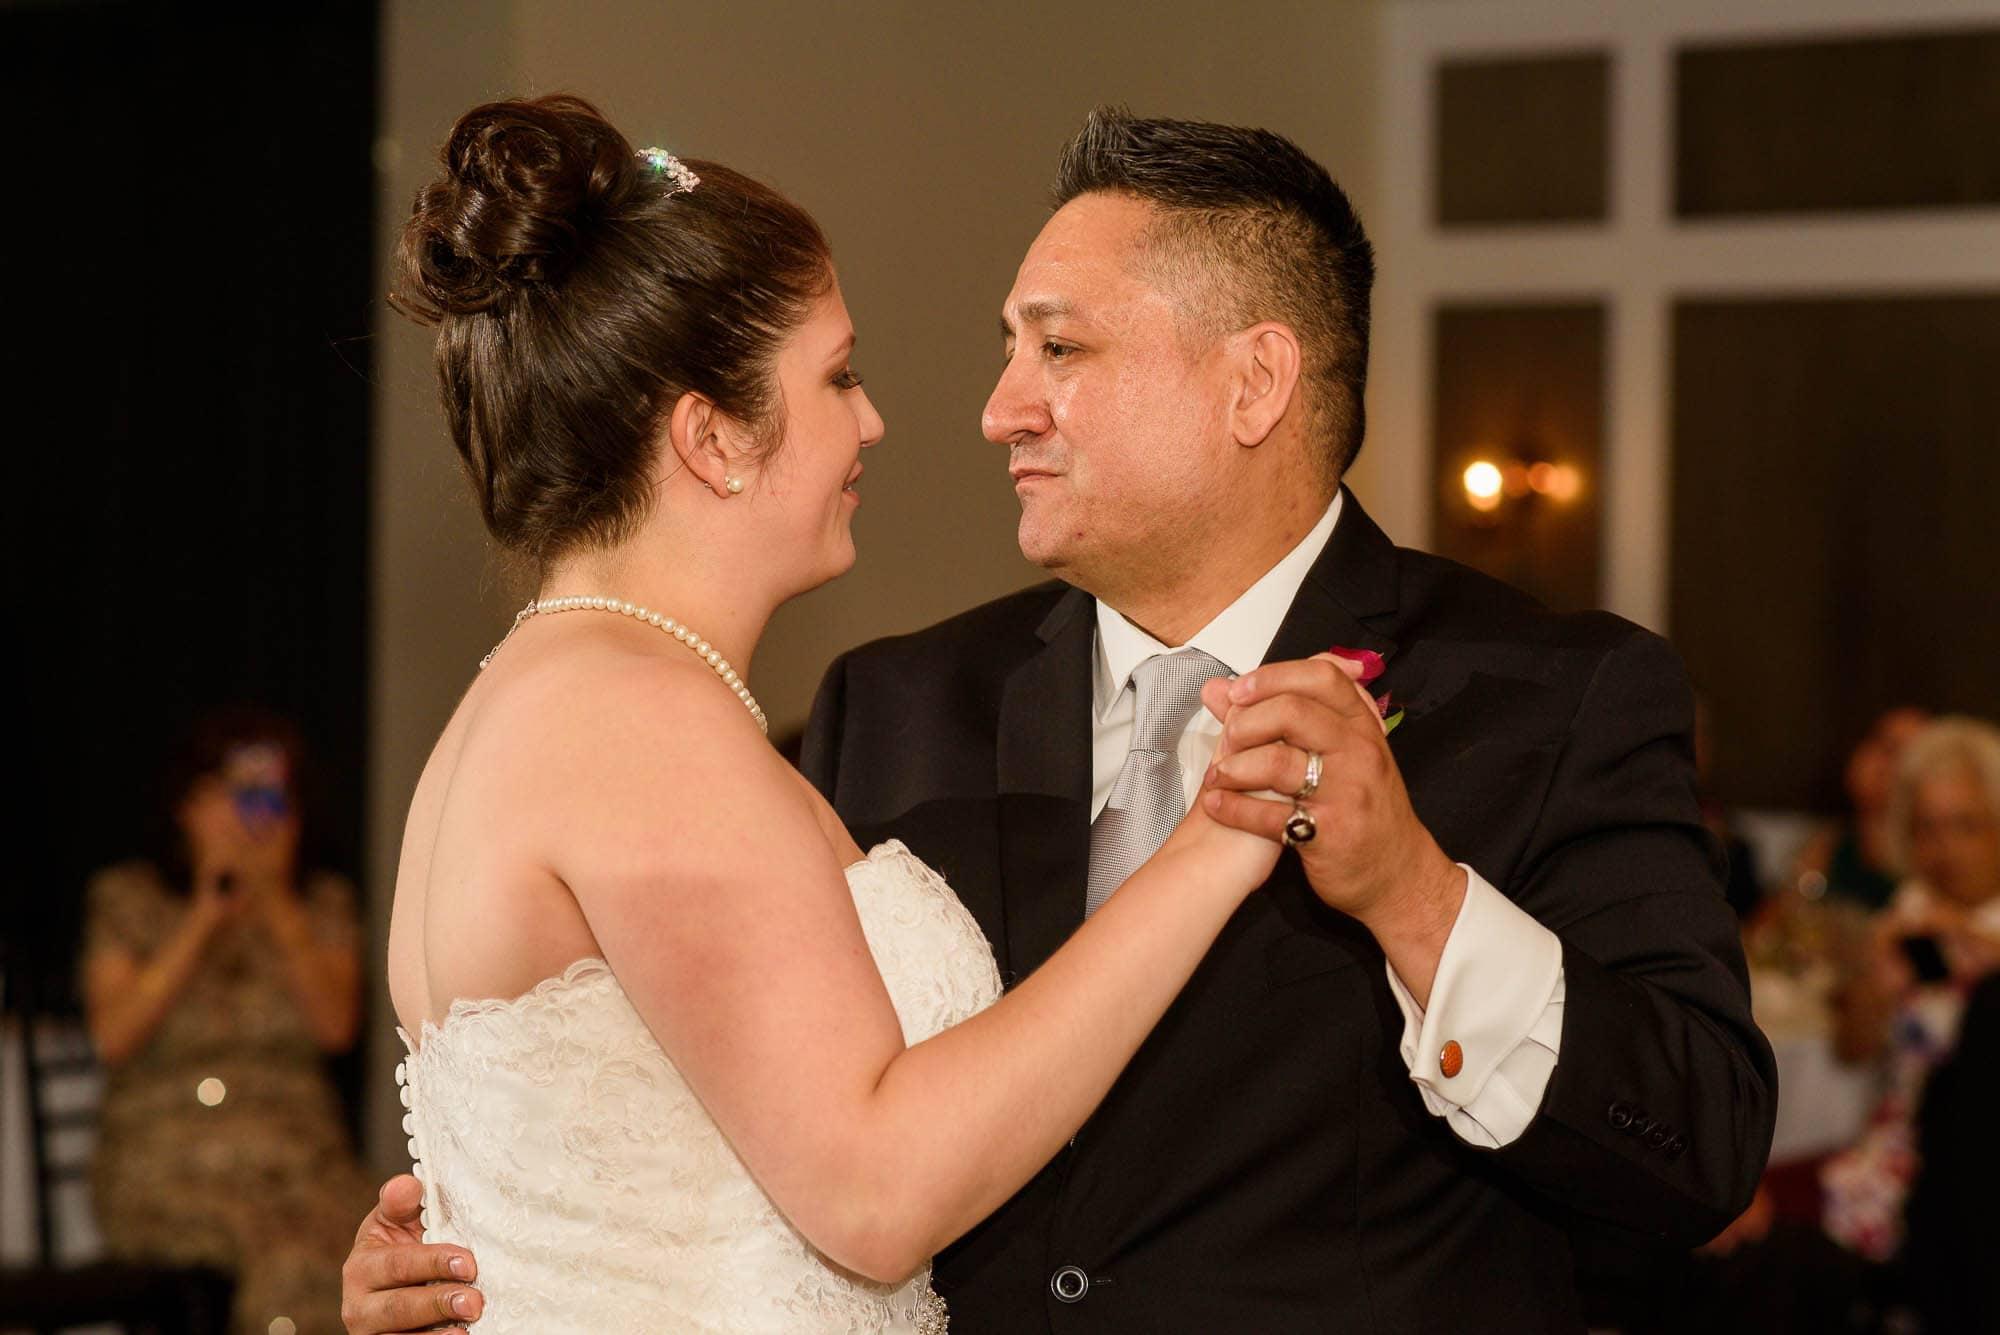 029_Alan_and_Heidi_Wedding_Nicole_Roman